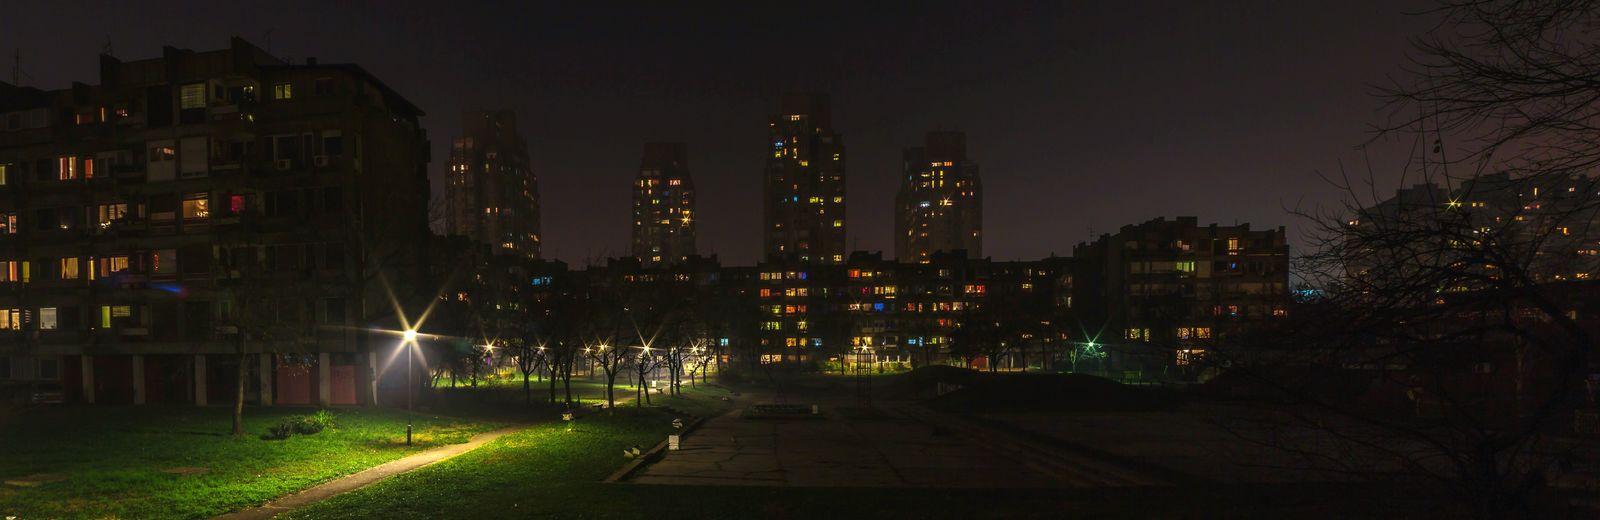 Streetphotography Nightphotography Longexposure Park Blok 23 Novibeograd Xmaslights Arhitecture City Life Hood HOODLIFE